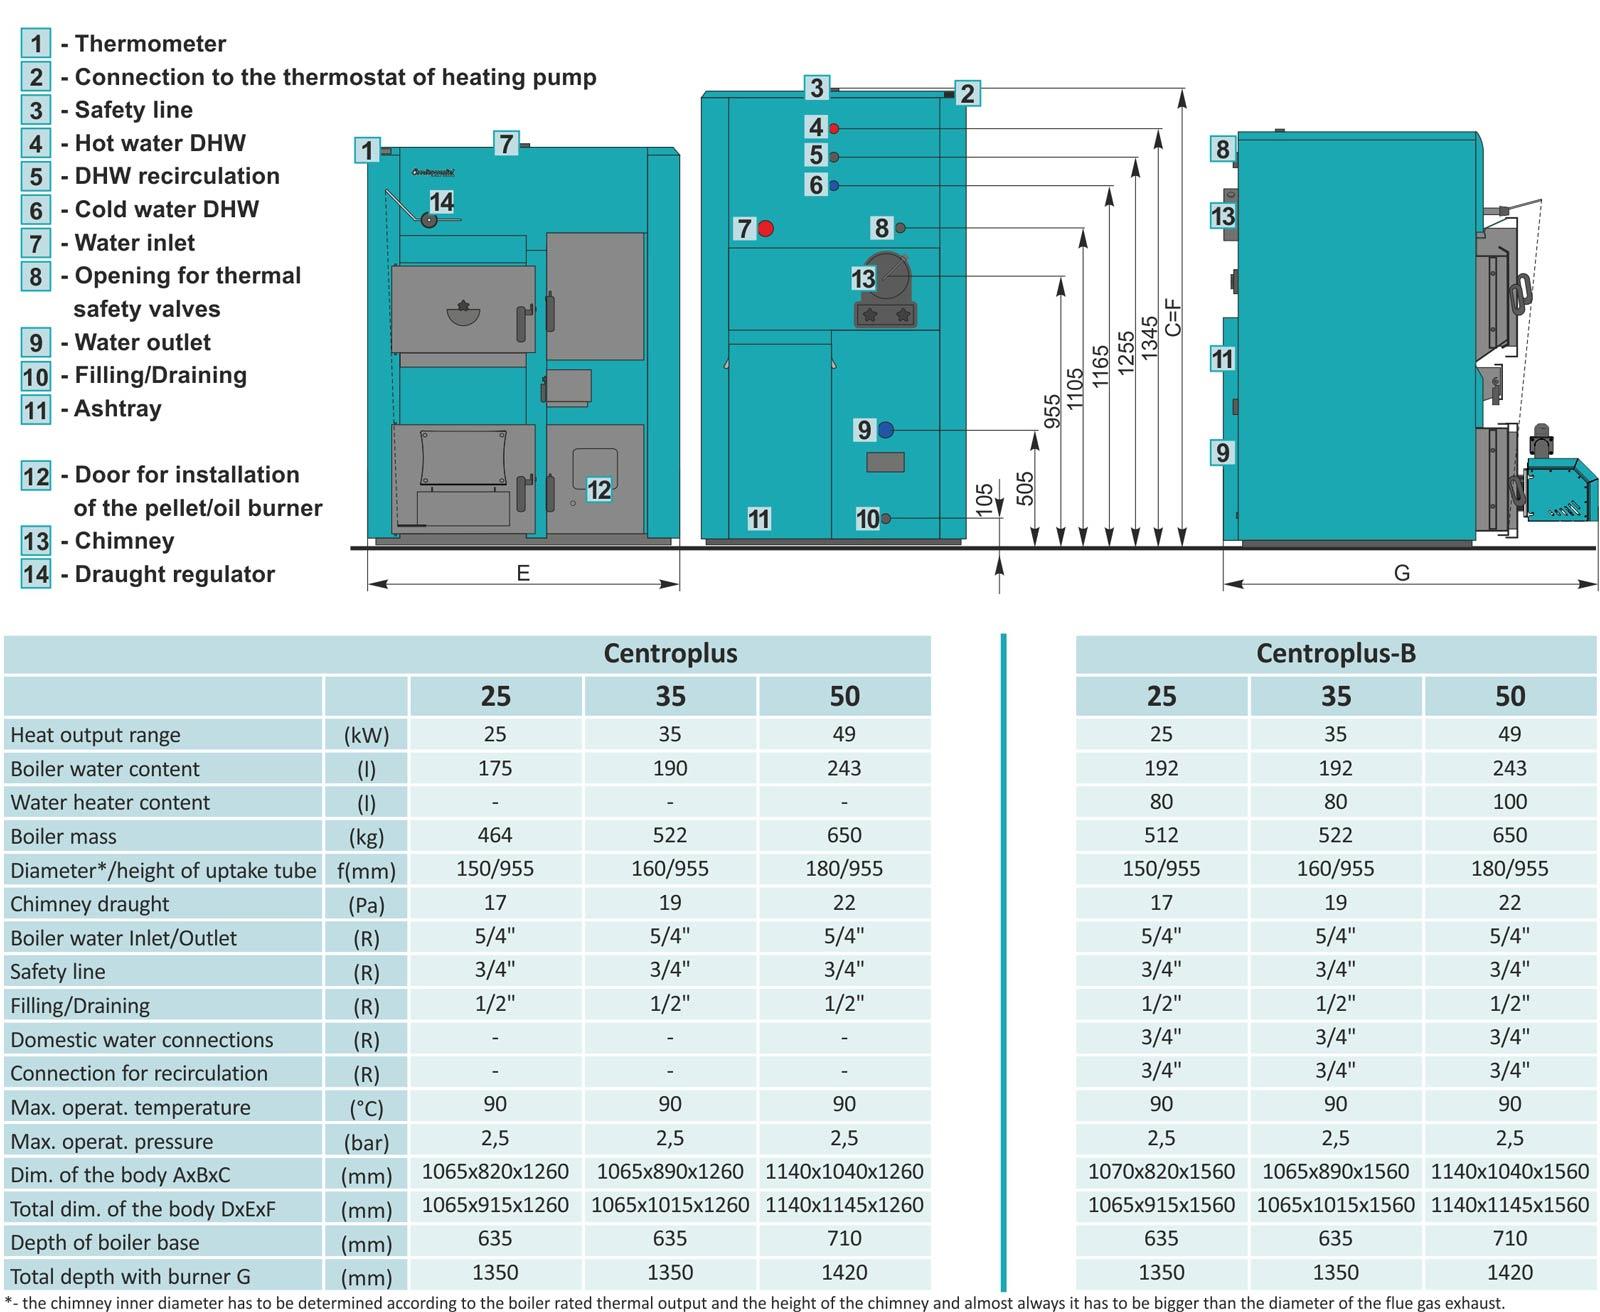 CentroPlus / CentroPlus-B (25/35/49 kW) - Centrometal | TEHNIKA GRIJANJA